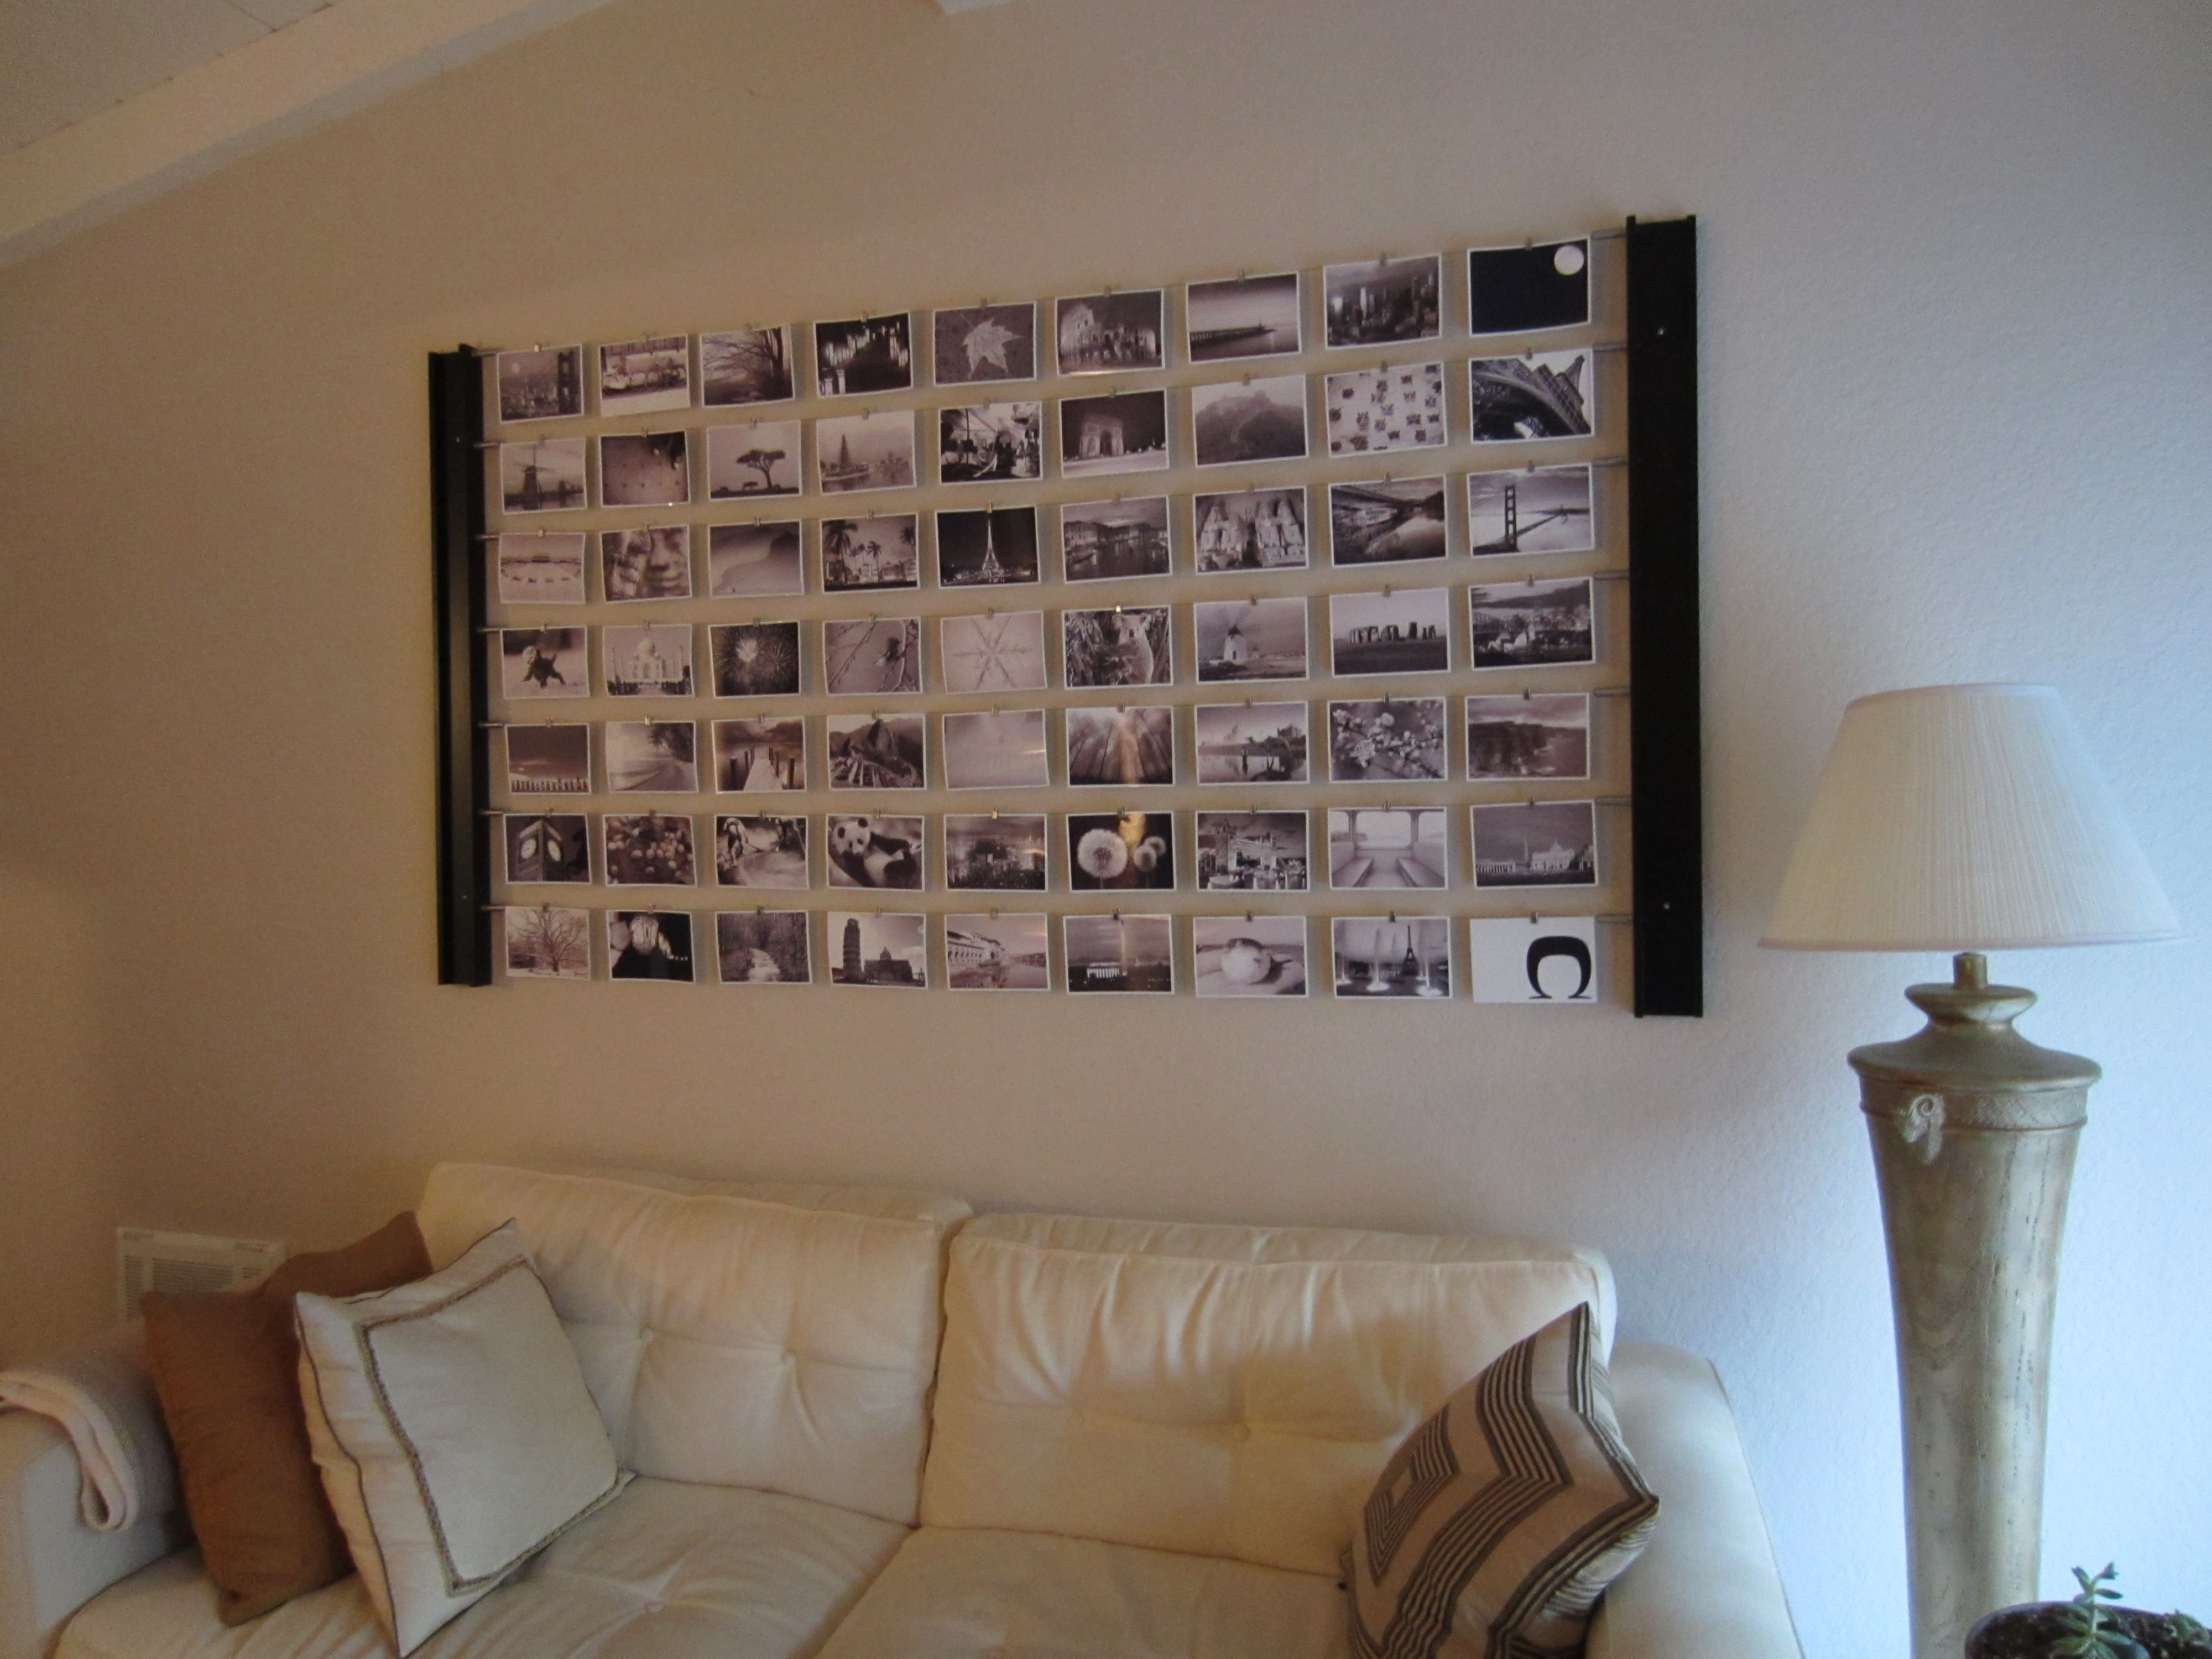 diy photo wall d�cor idea | quick cash, photo wall decor and photo